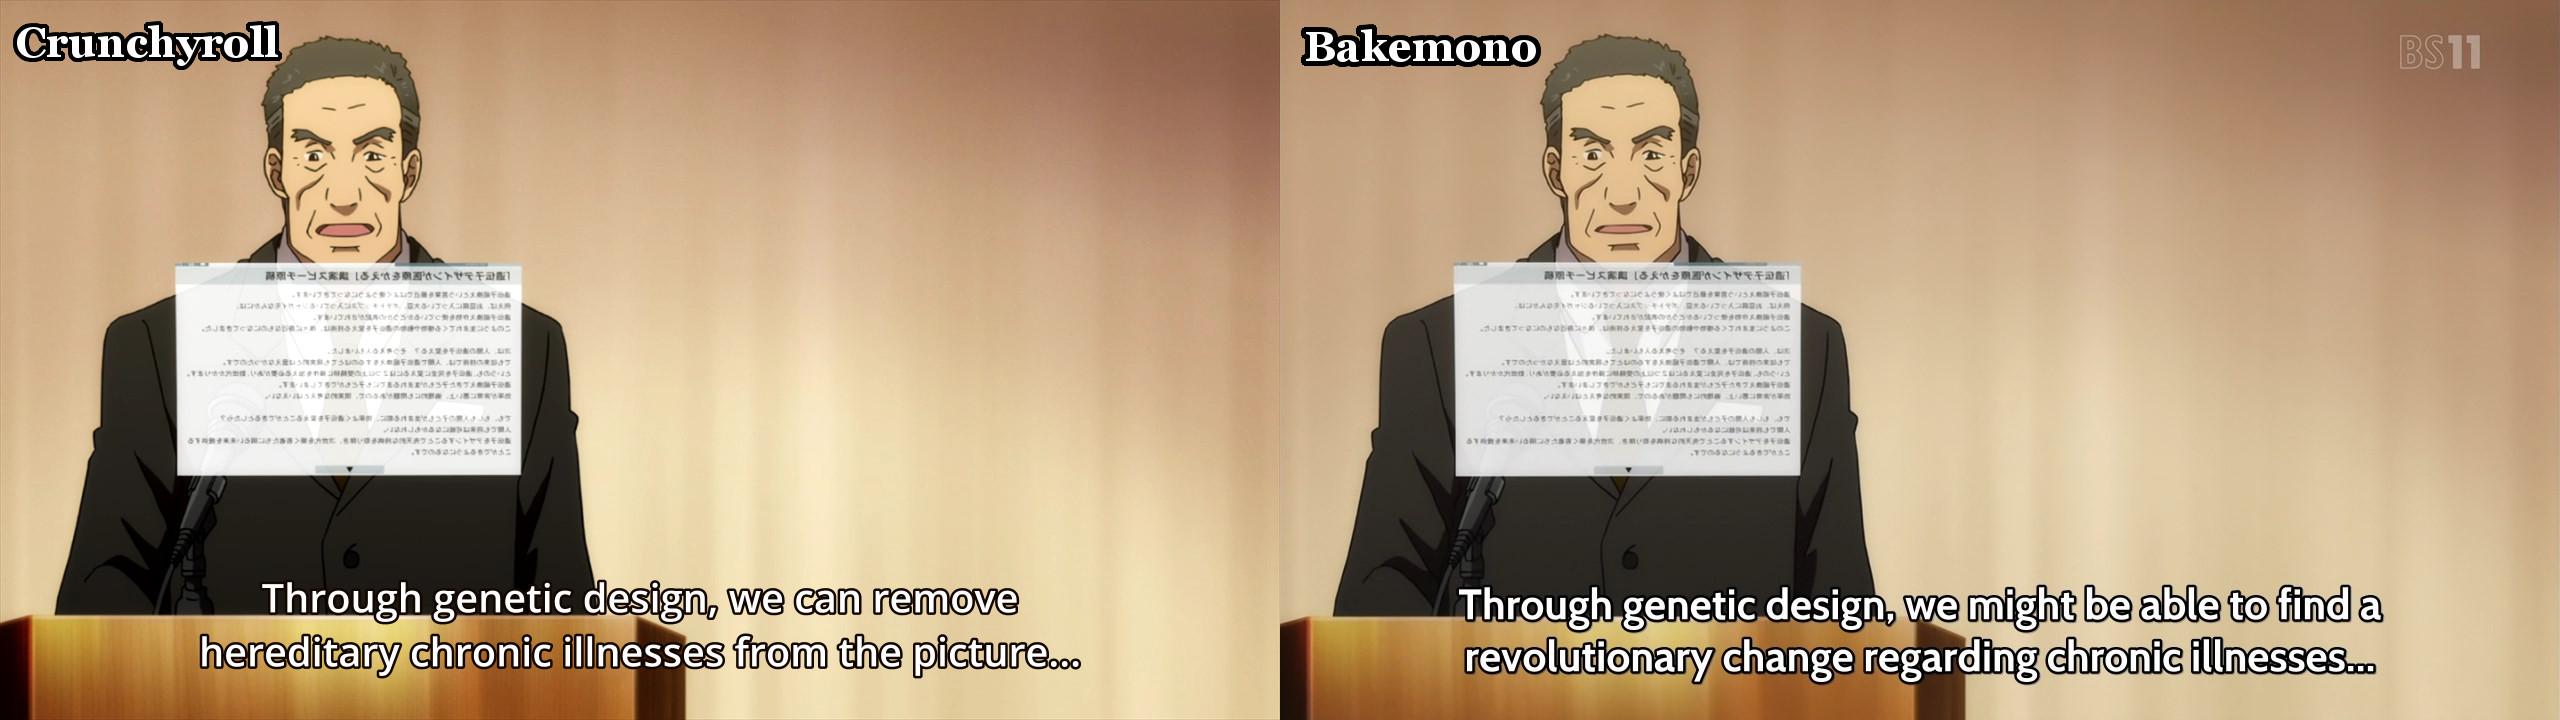 crunchyroll_versus_bakemono_-_trickster_-_cb1